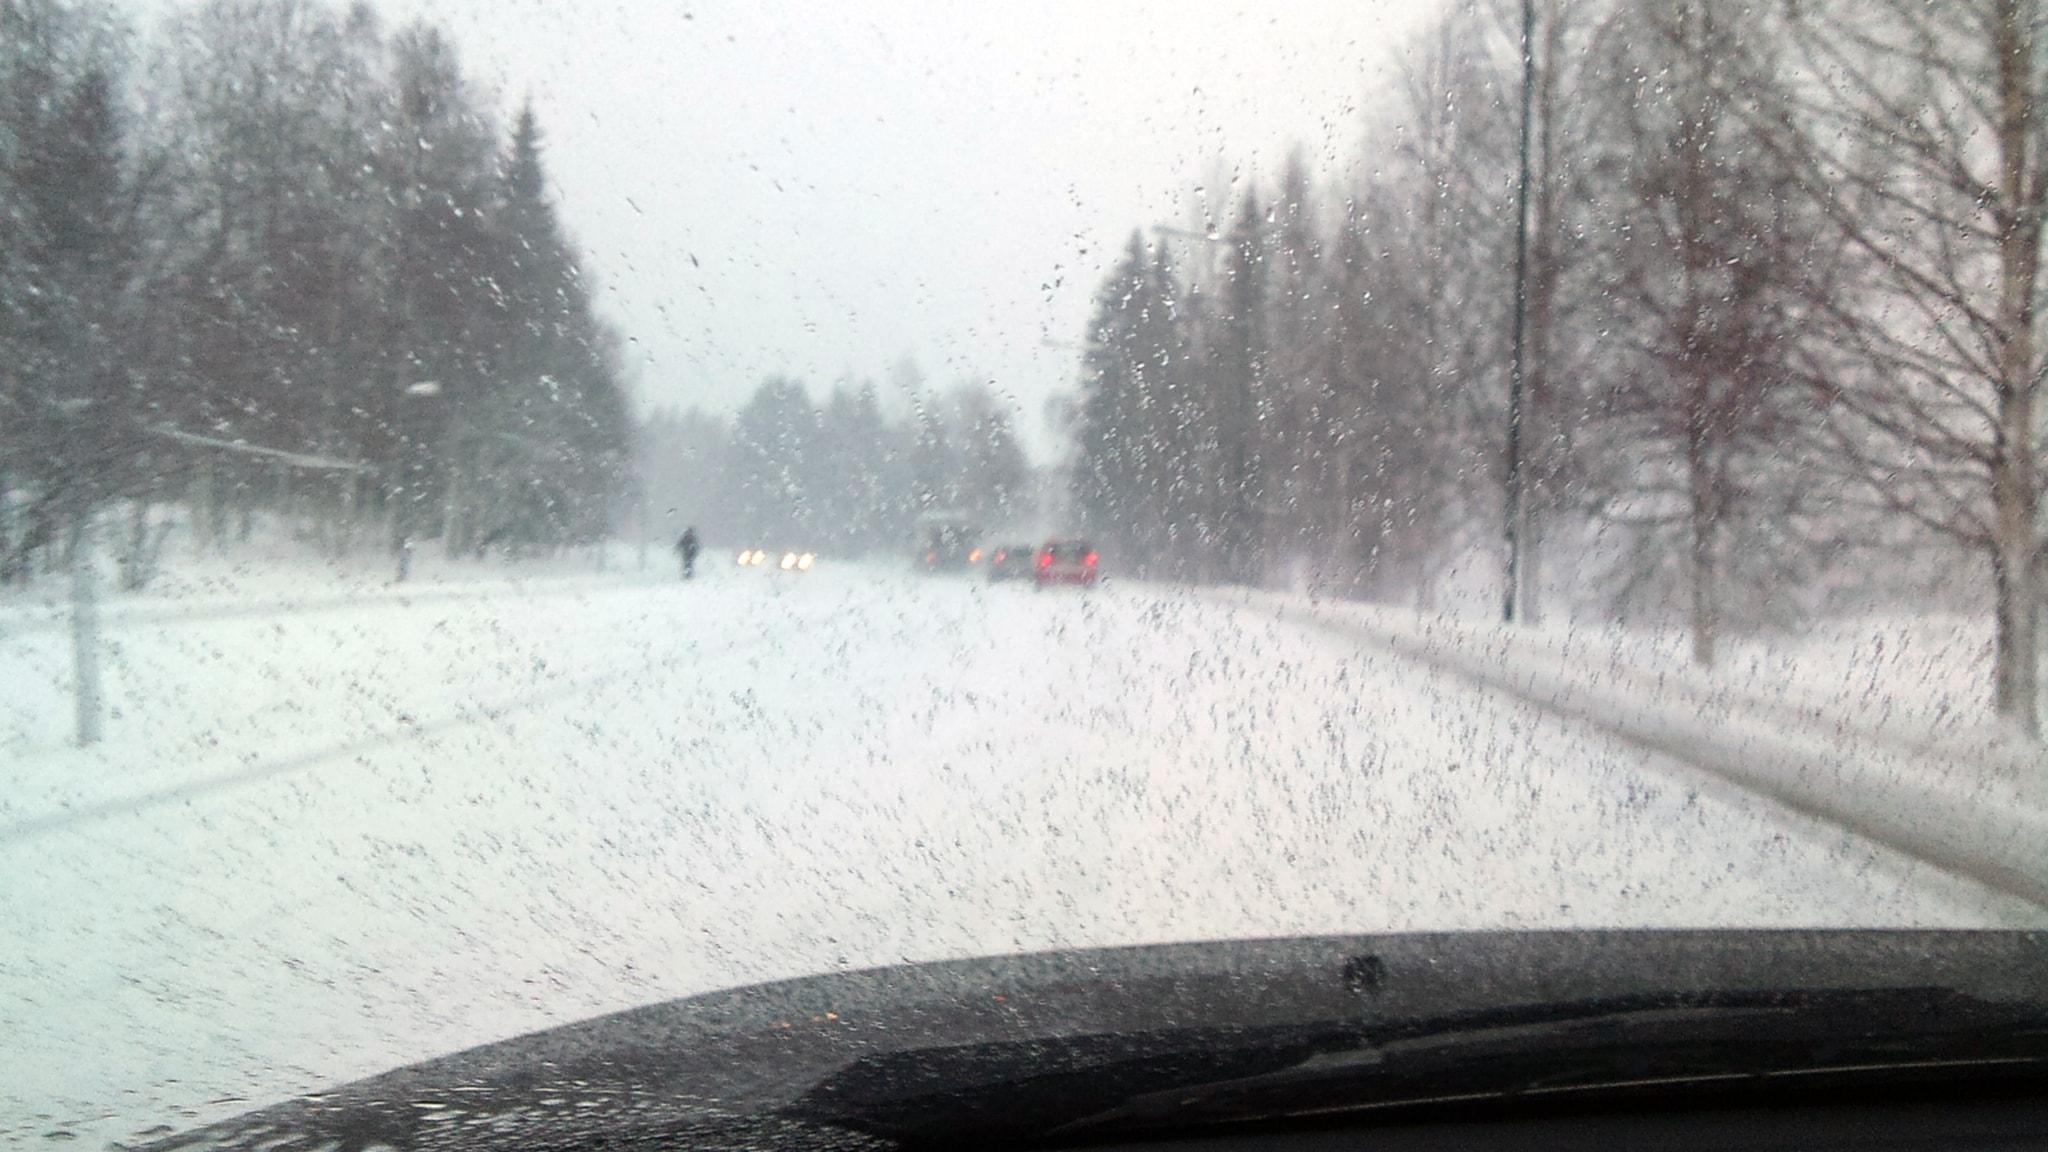 Smhi varnar for regnet trafiken far problem